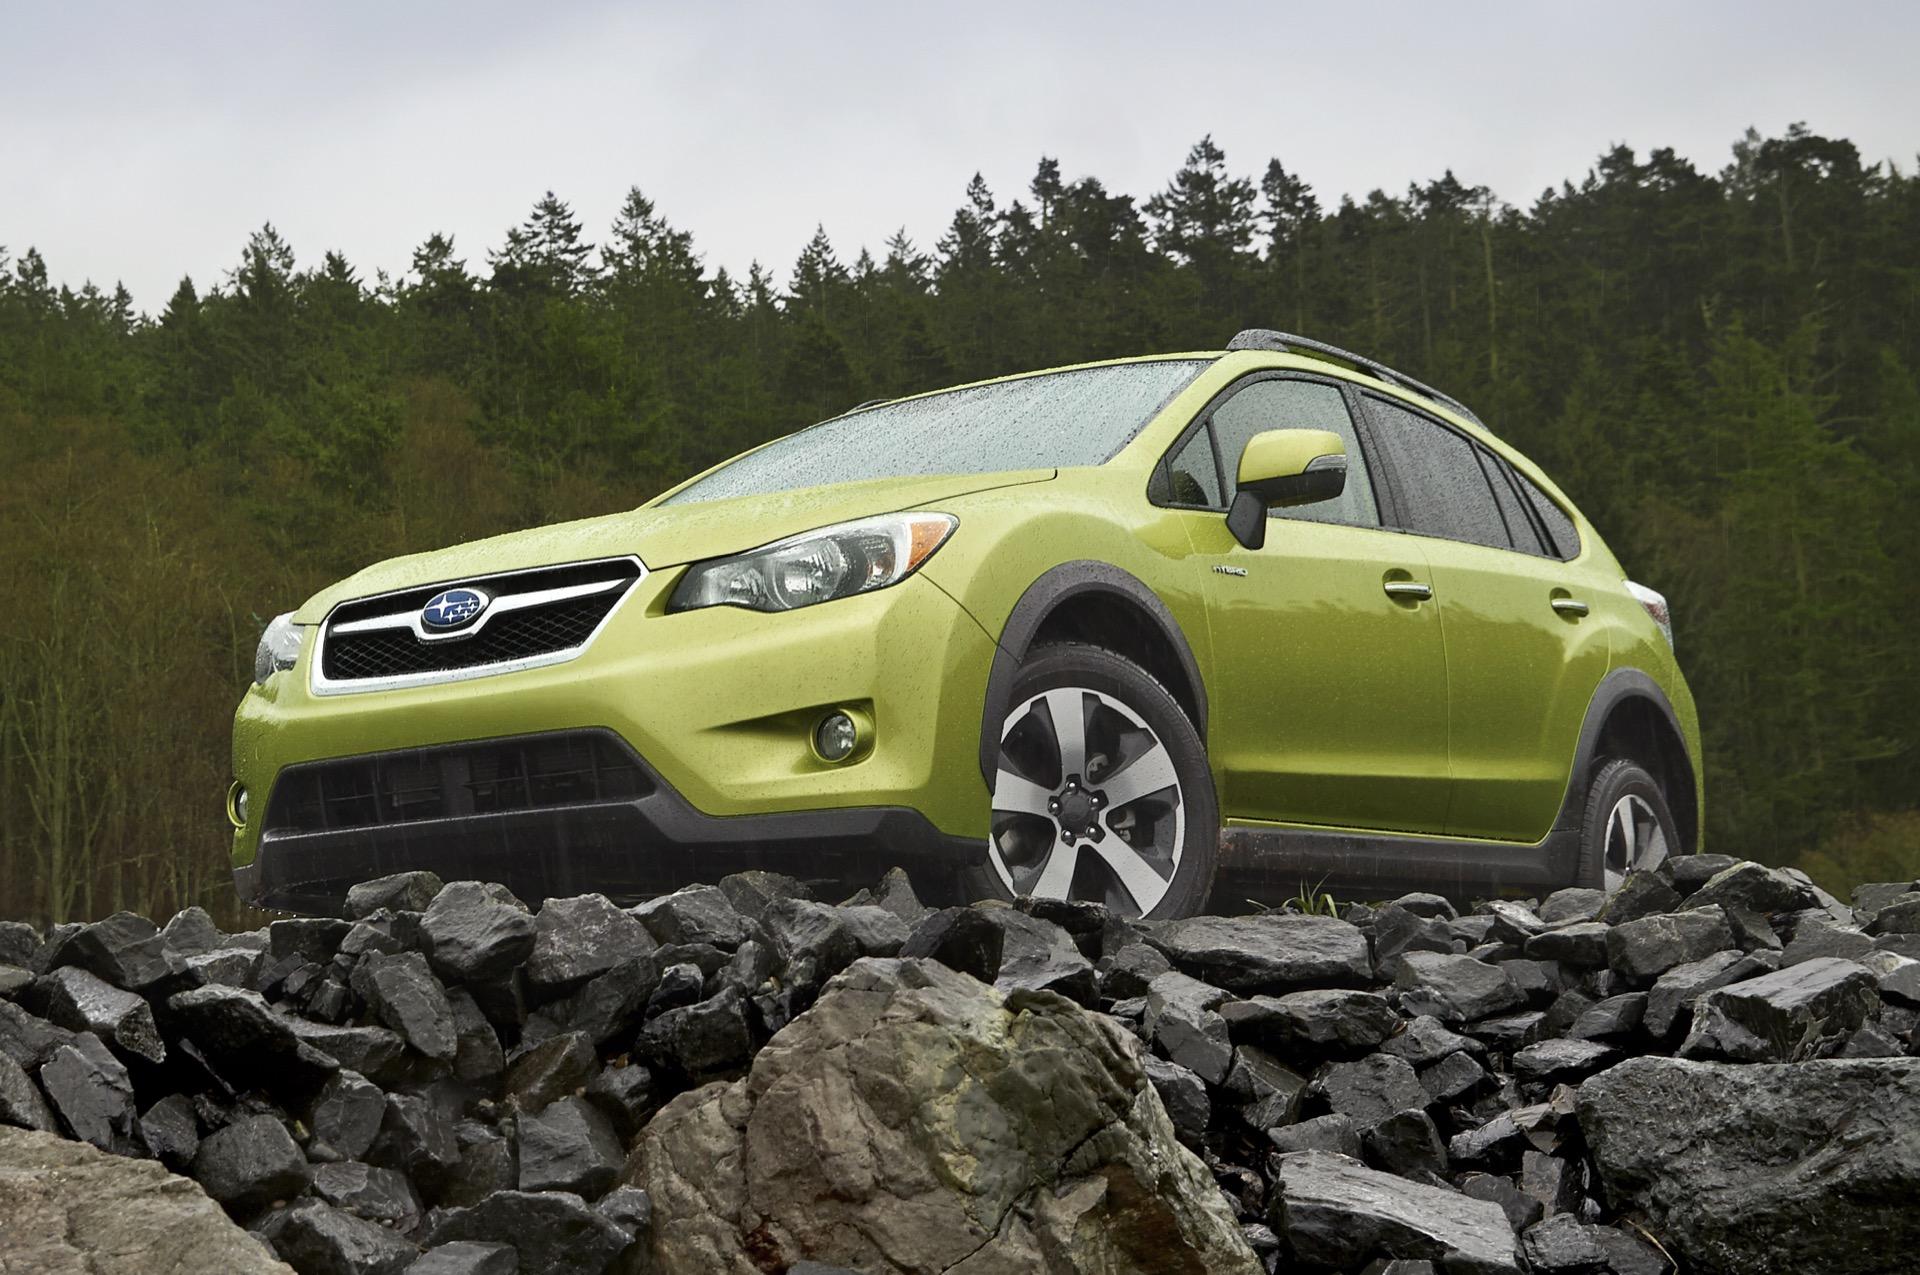 Subaru Crosstrek Hybrid discontinued for 2017 model year